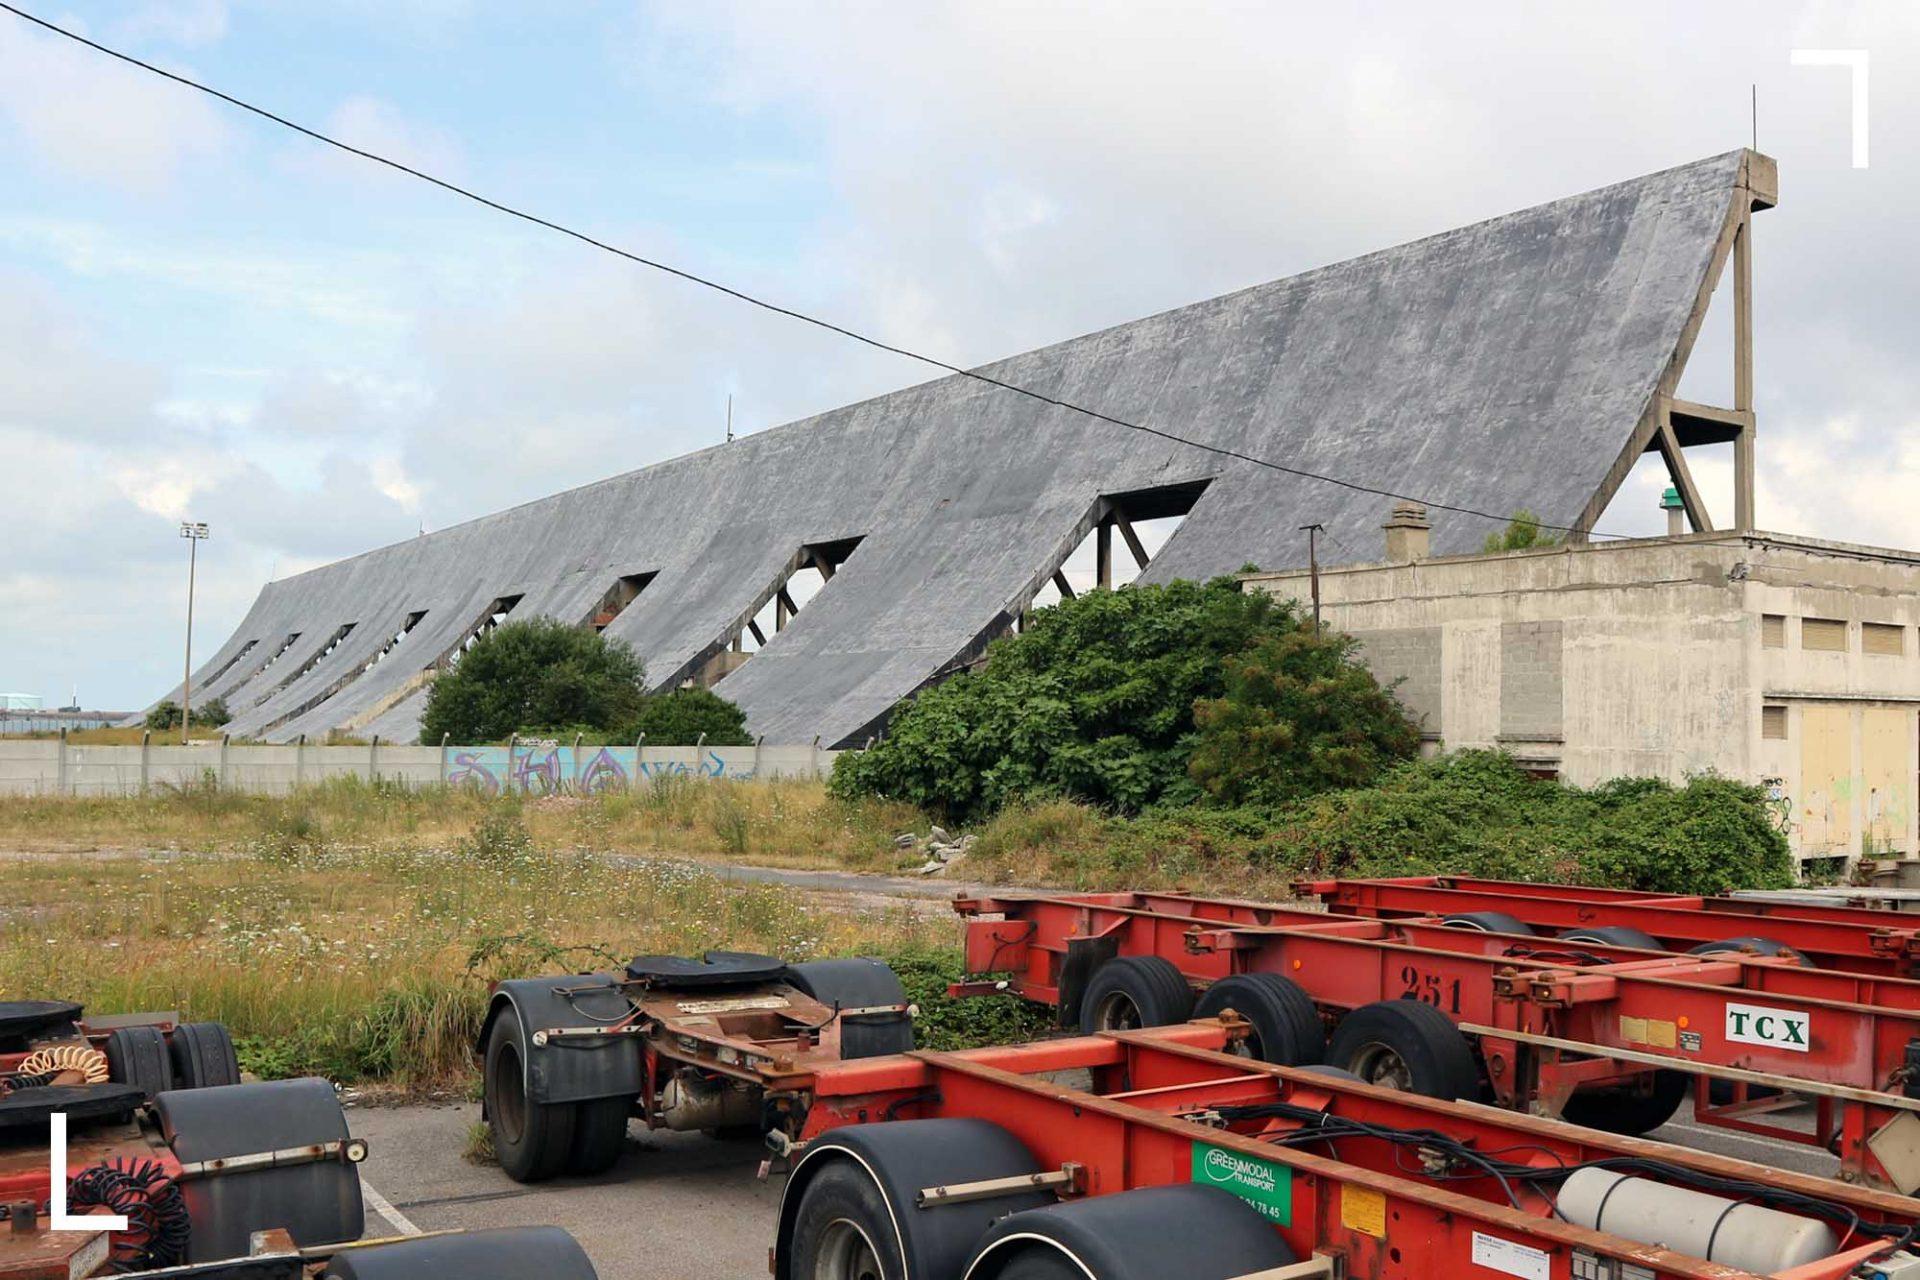 Betonriese, Windschutz, Halfpipe. Die Stahlbetonkonstruktion in der Hafenstadt Le Havre